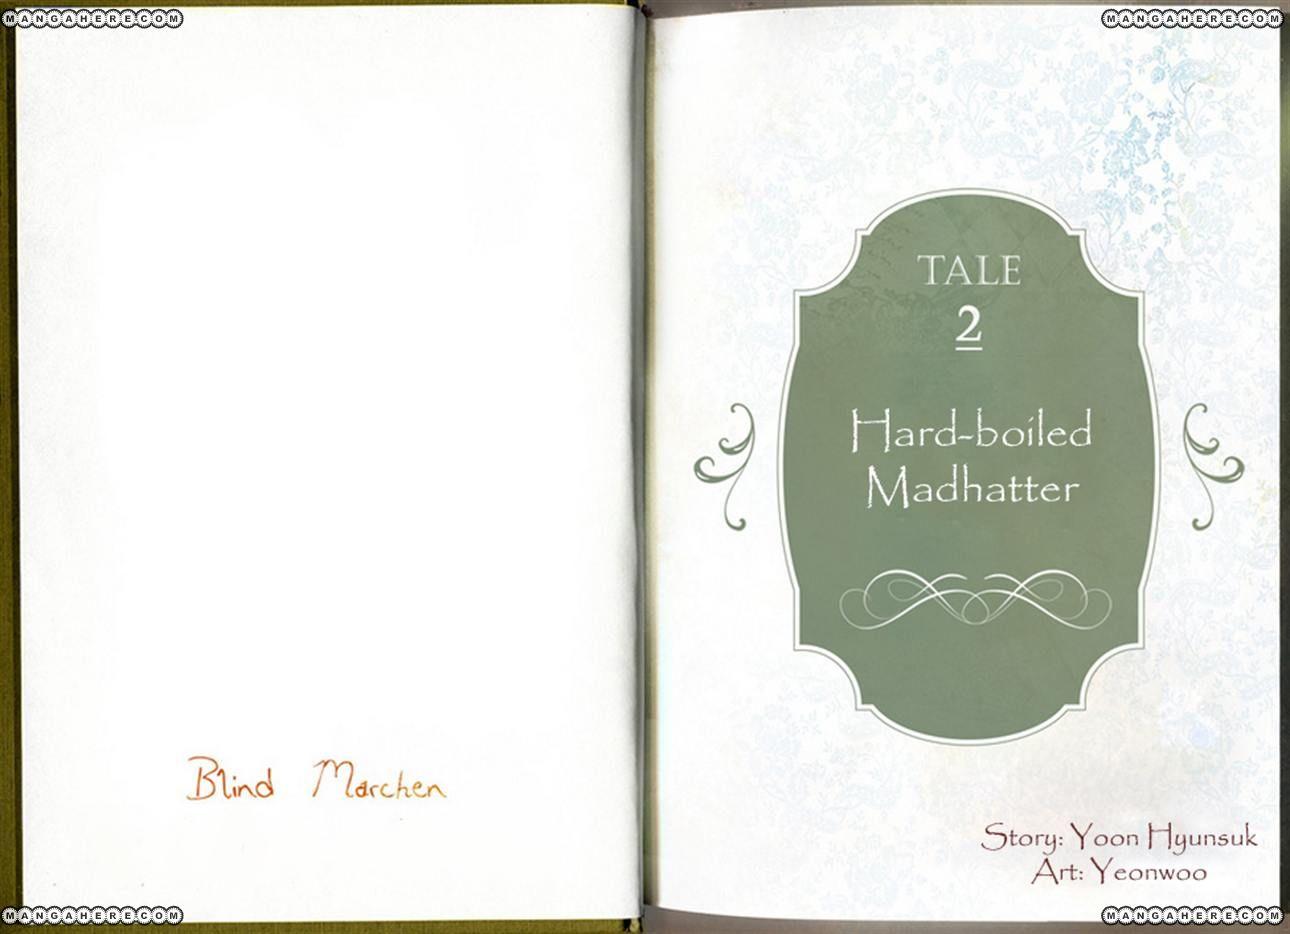 Blind Märchen 2 Page 1